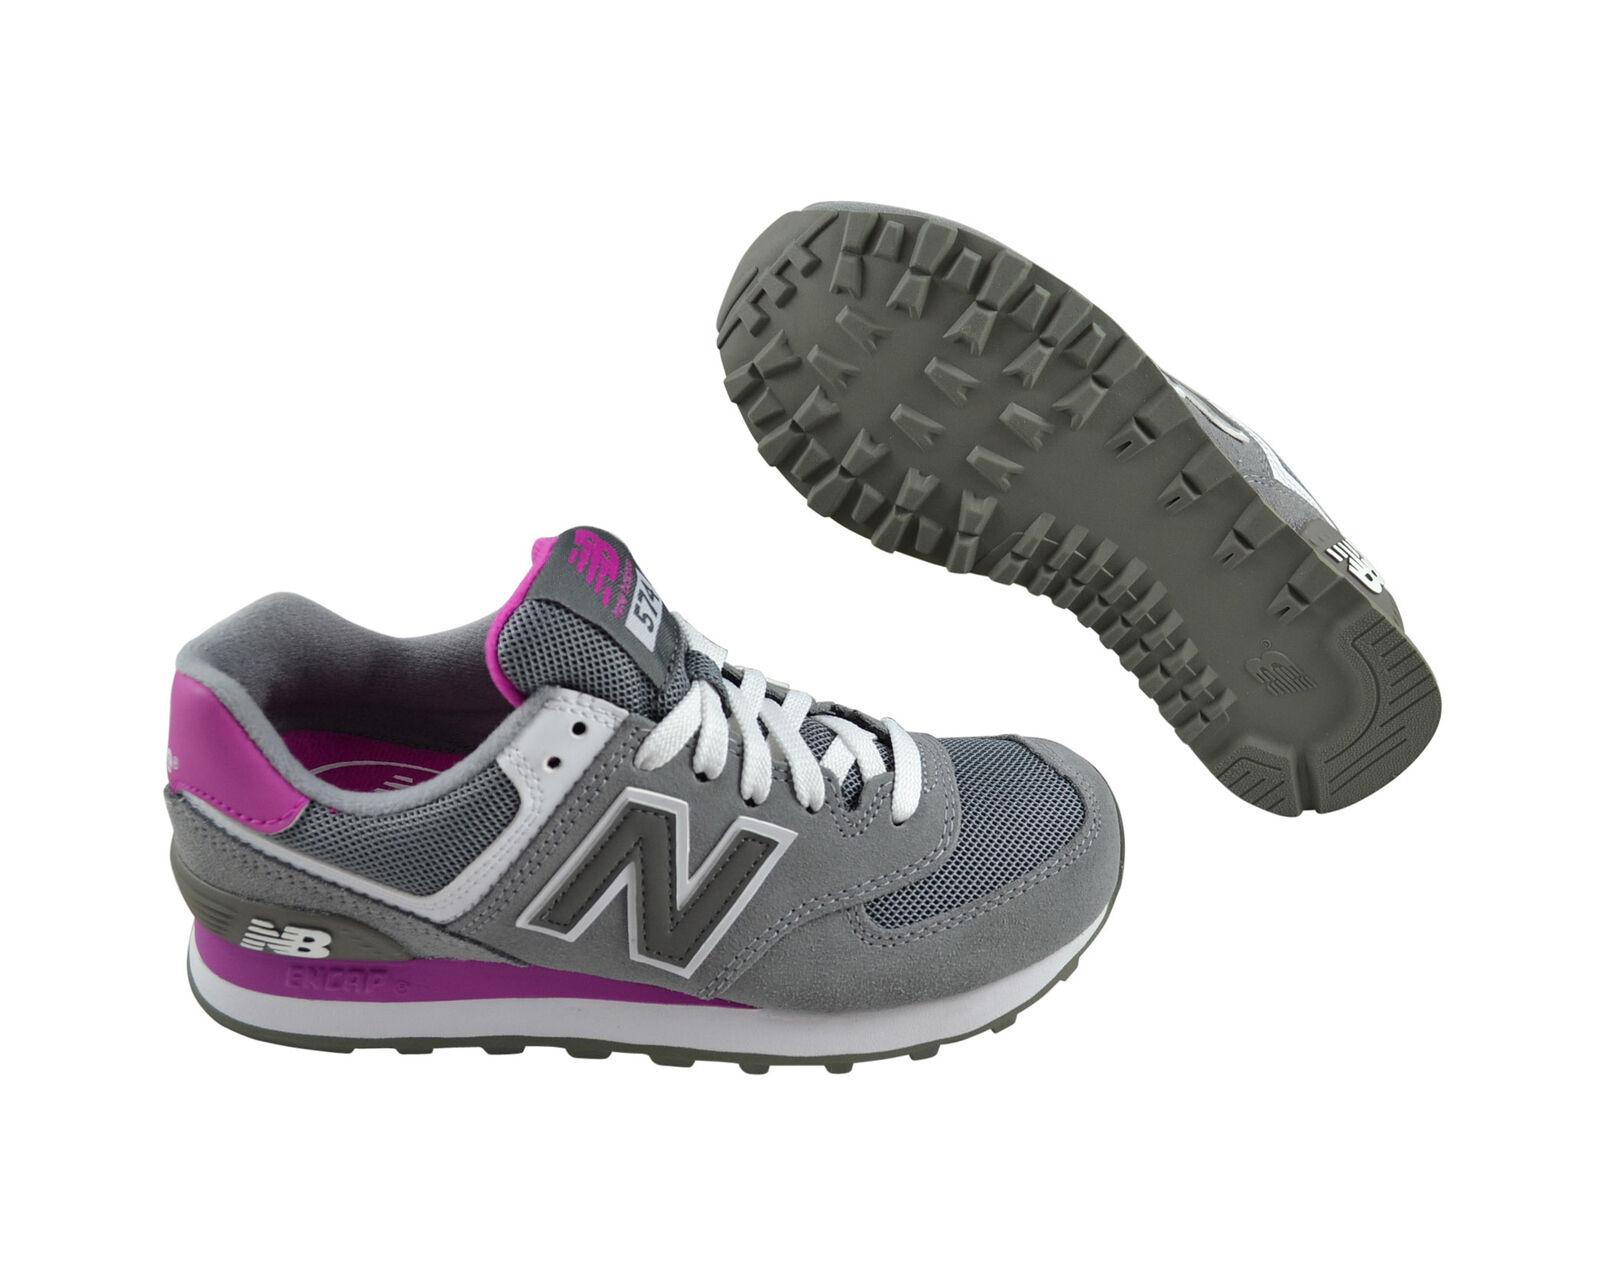 Casual salvaje New balance wl574 cpq Steel zapatos/cortos wl574cpq